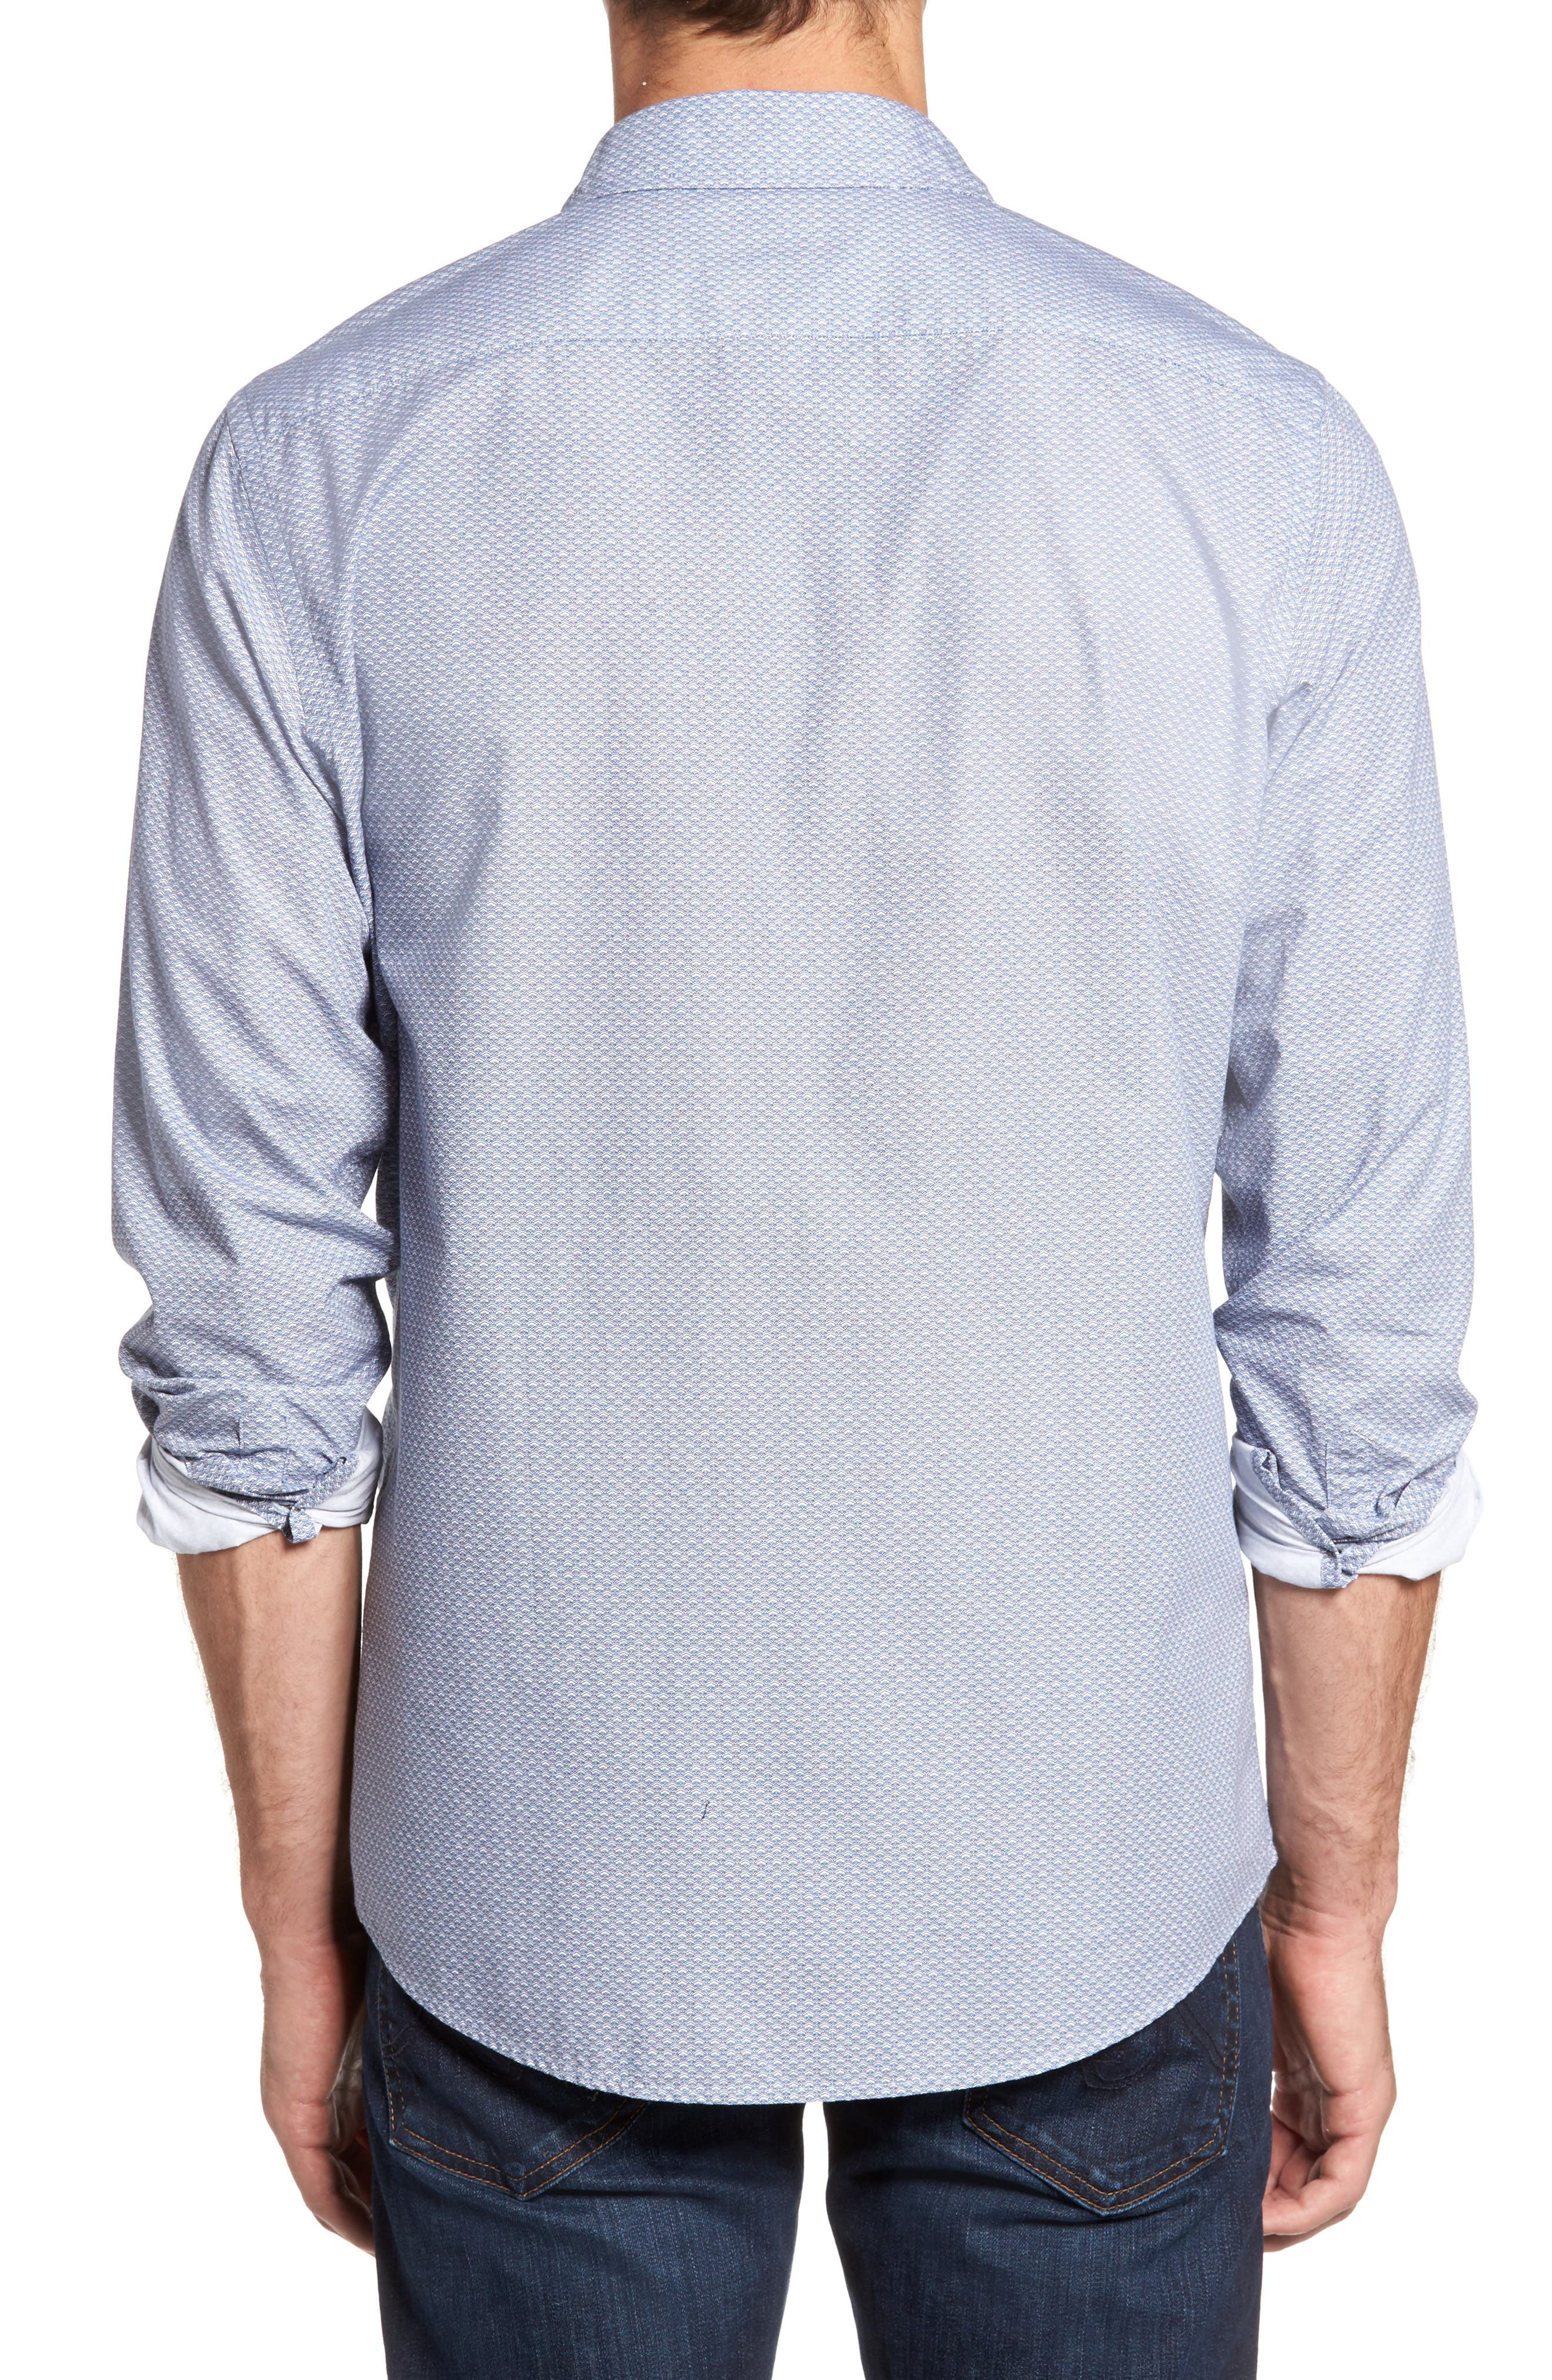 Macauley Sports Fit Print Sport Shirt,                             Alternate thumbnail 2, color,